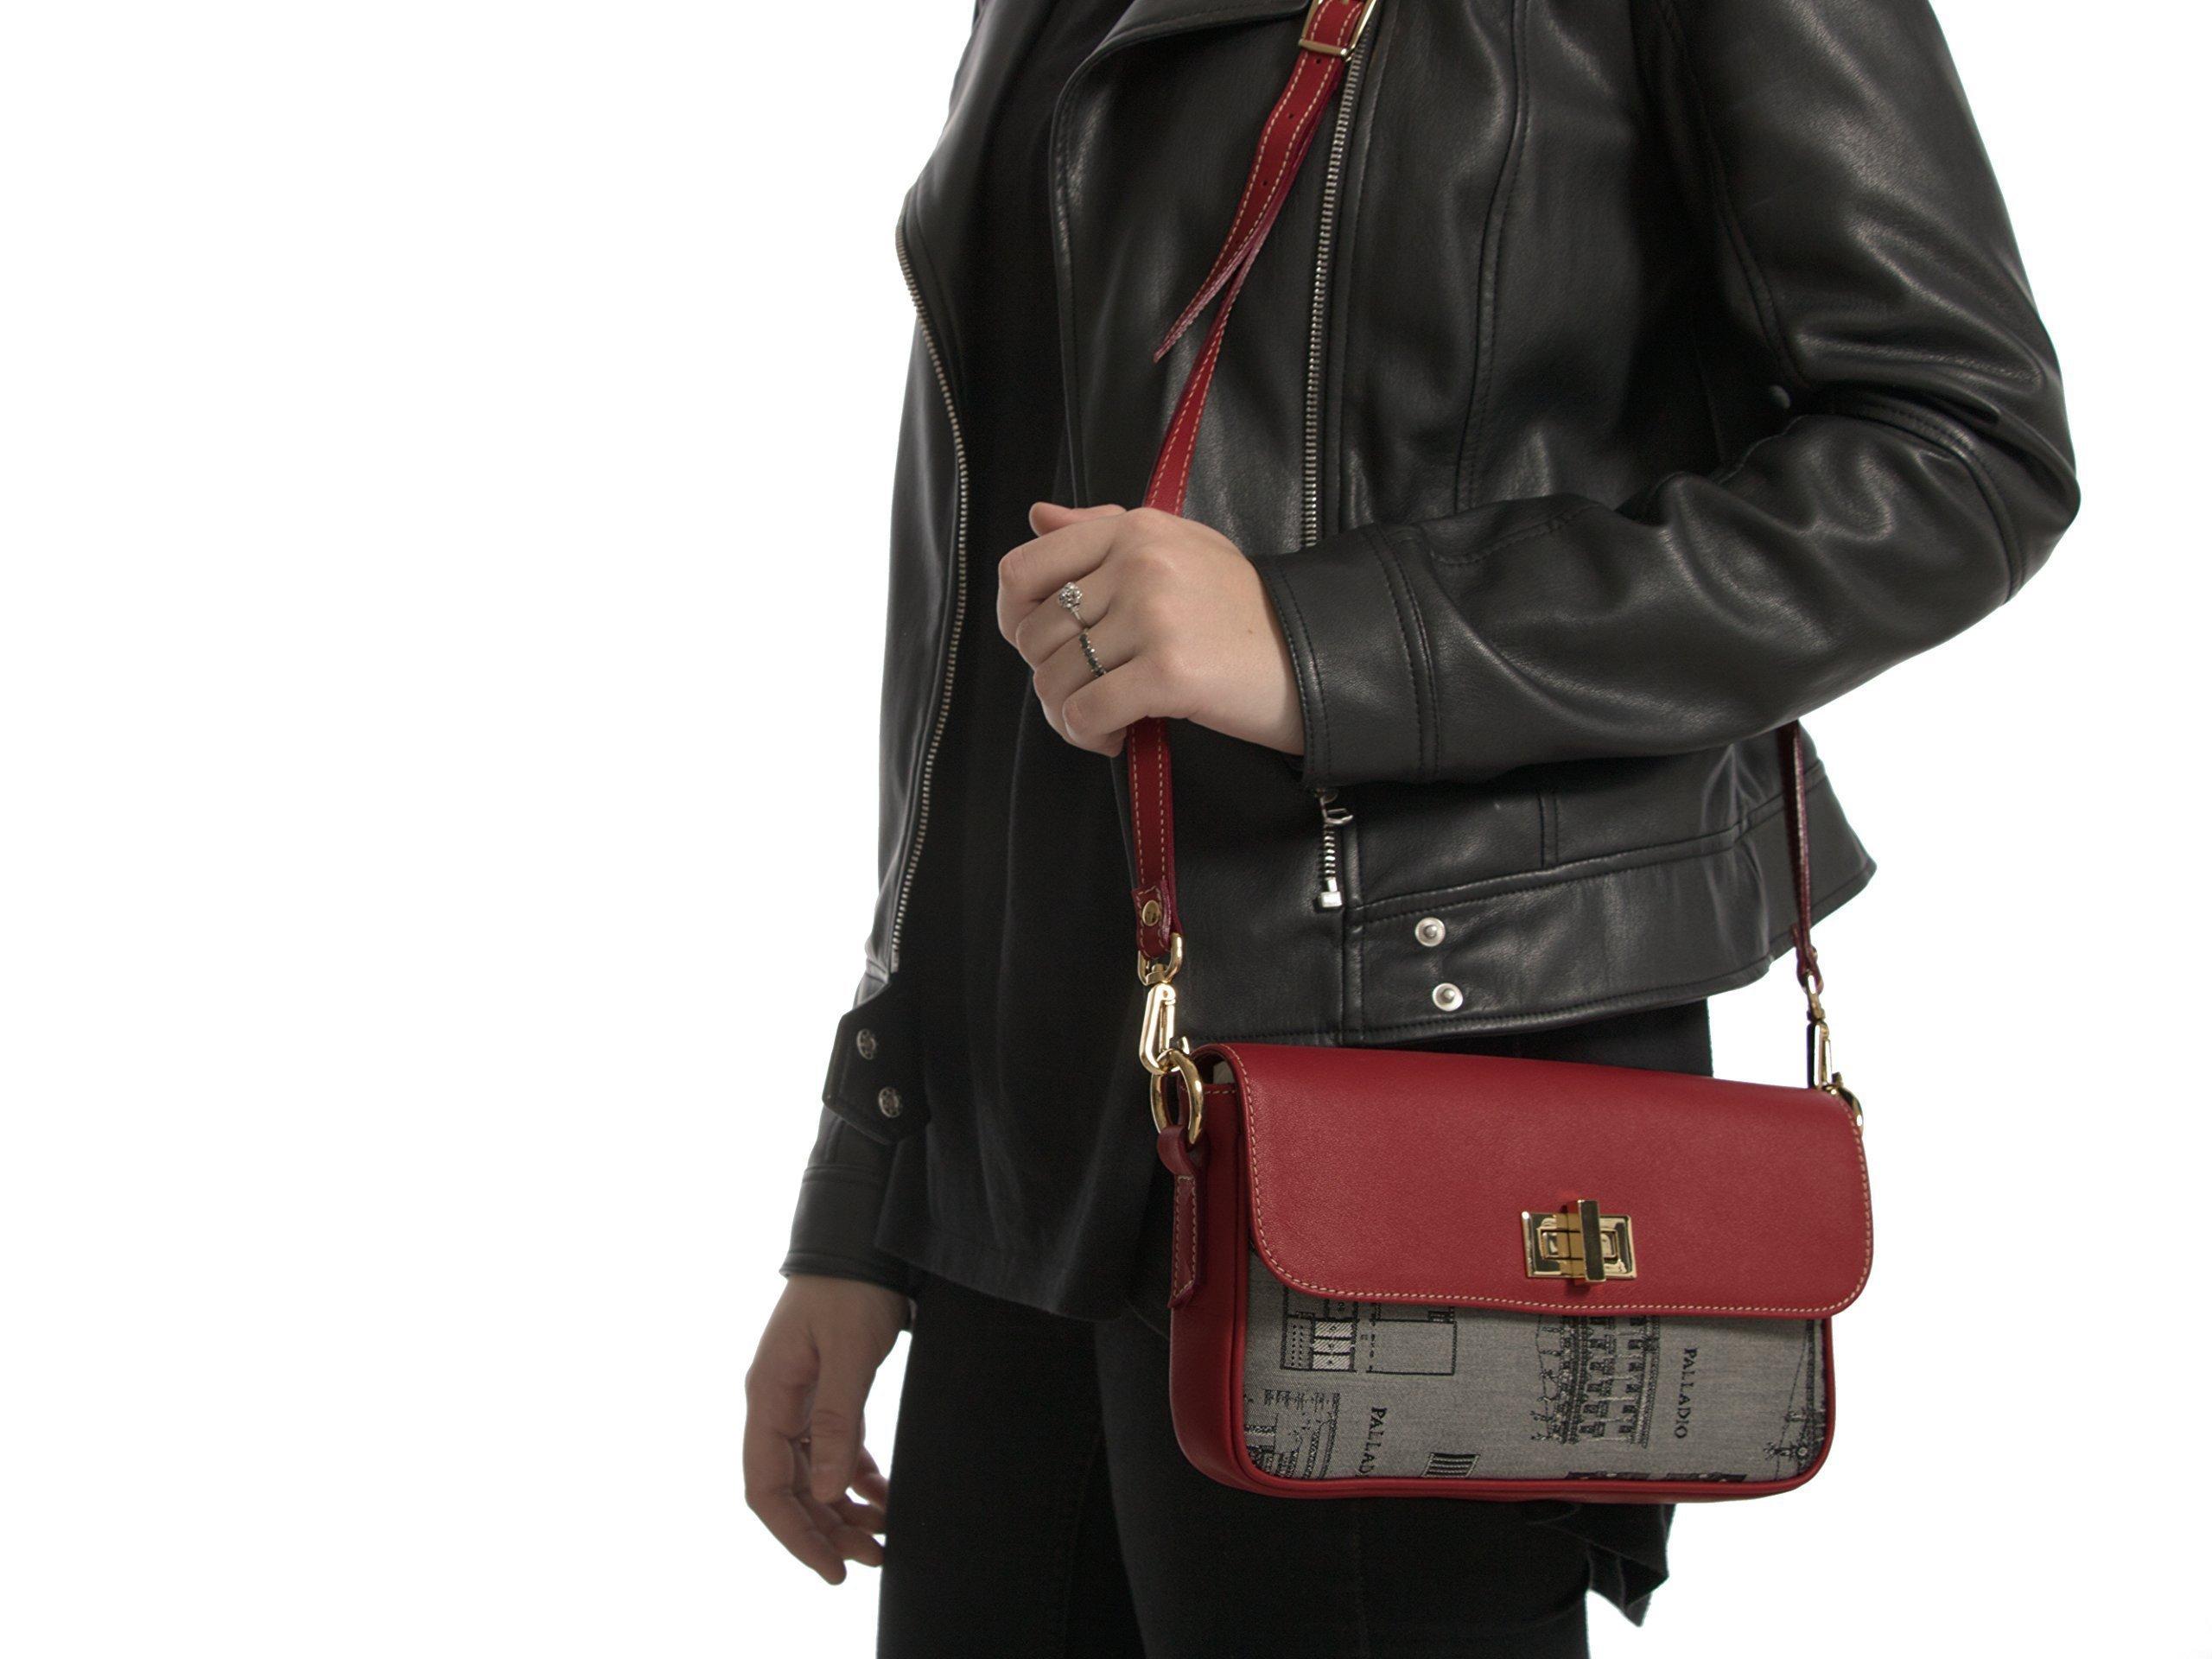 Borsa VILLA LA MALCONTENTA, Clutch bag with removable shoulder strap. Made in Italy - handmade-bags